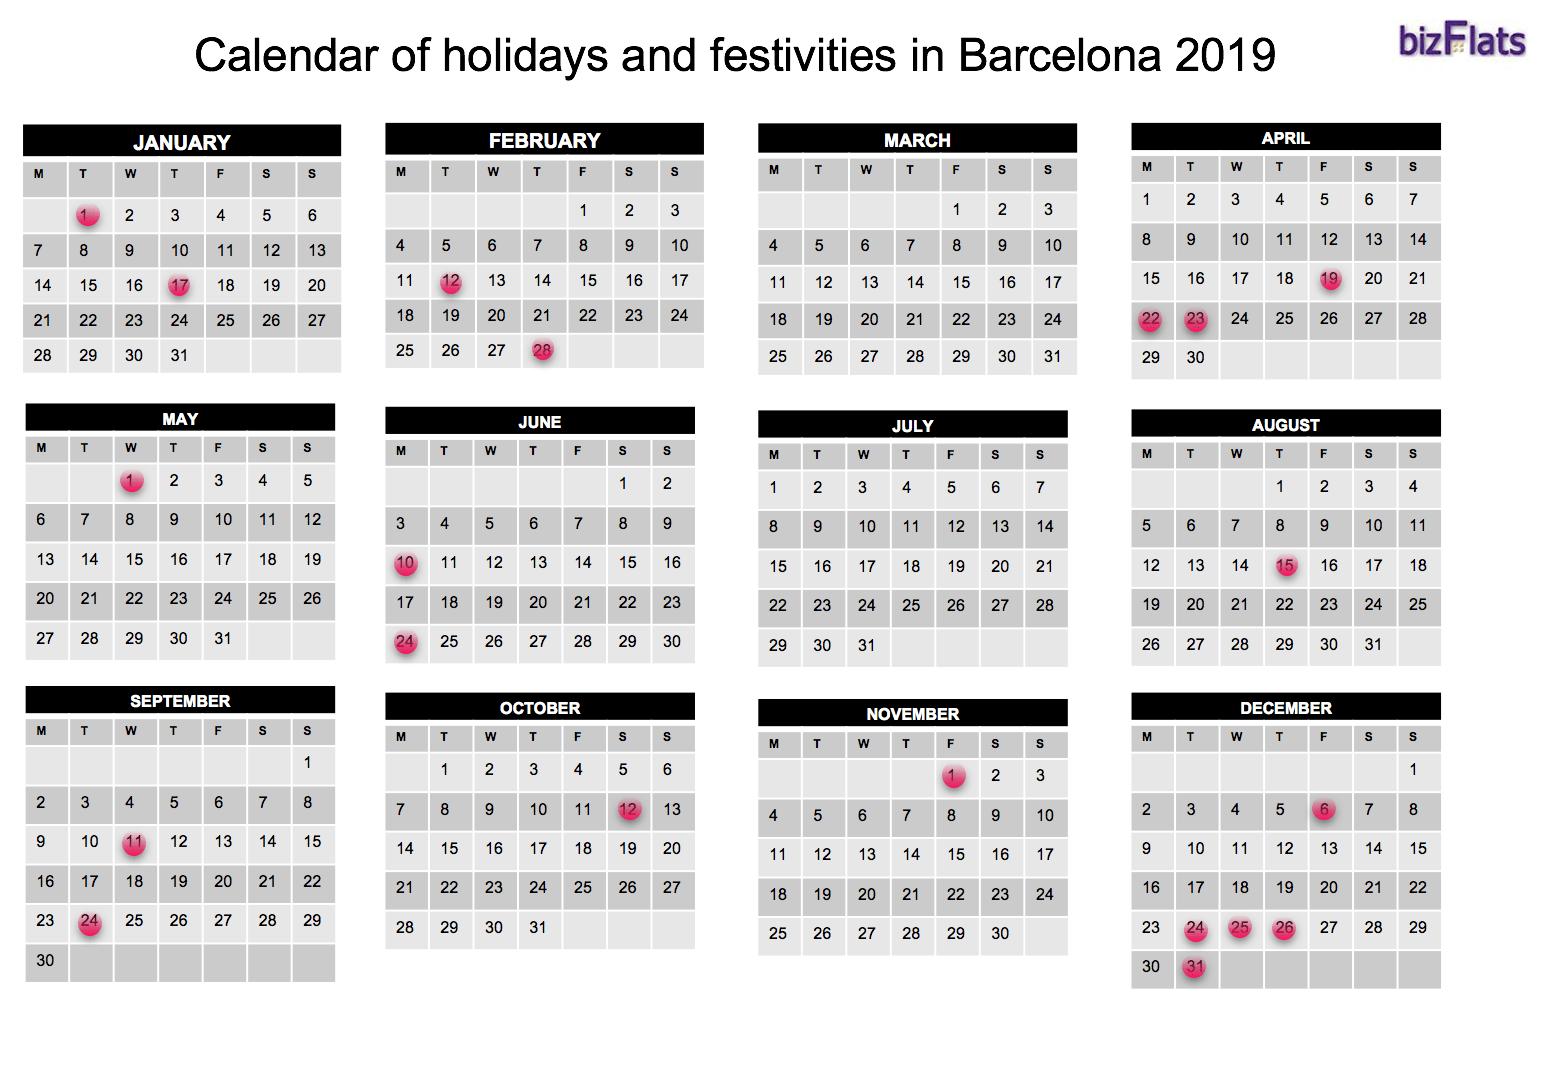 Calendar of Holidays in Barcelona